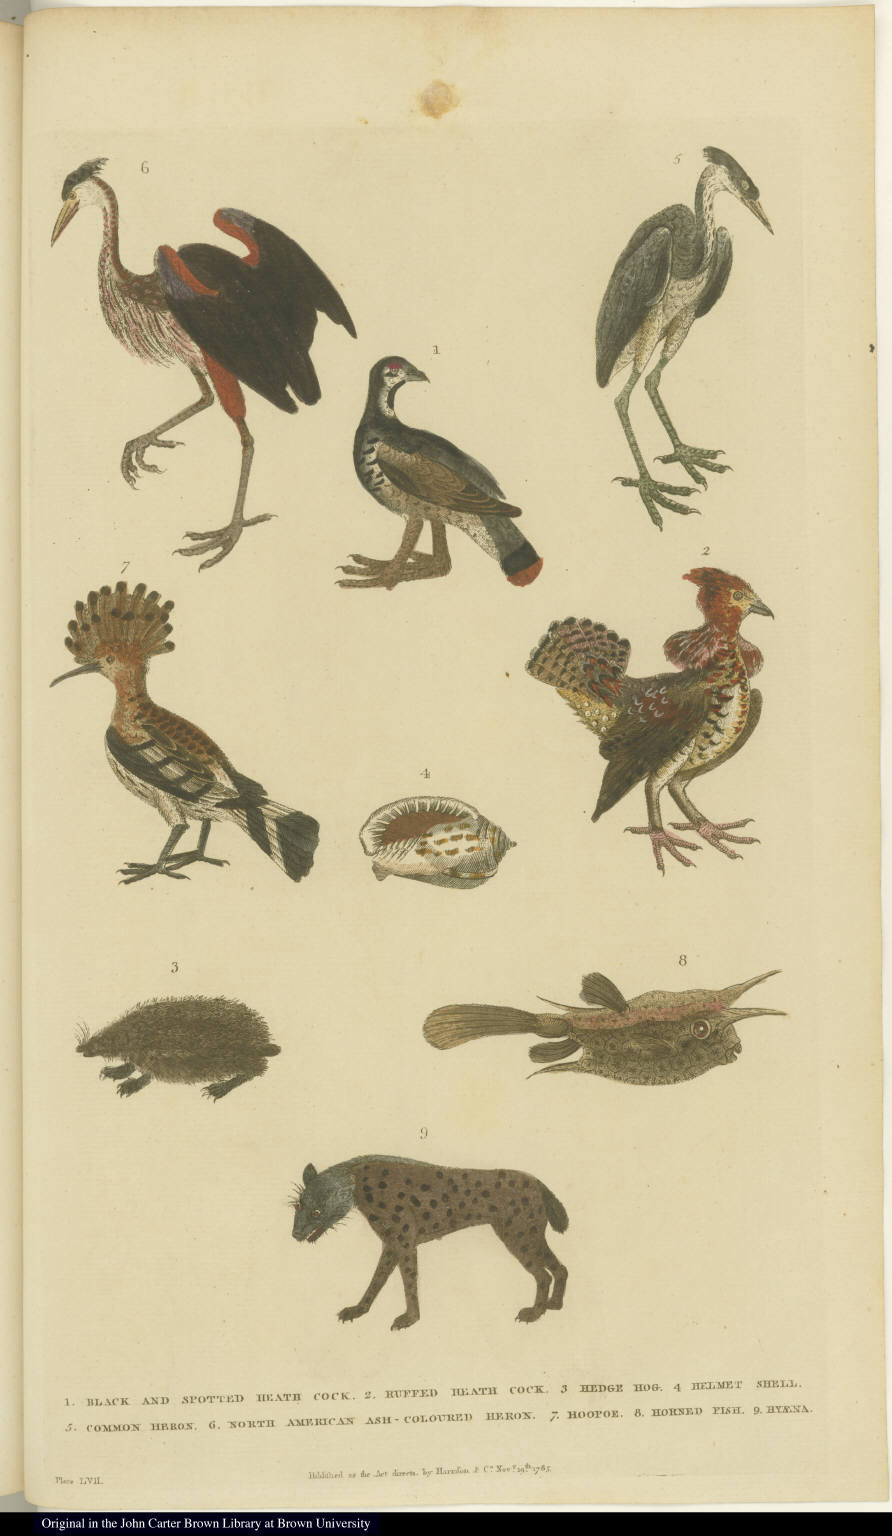 [Birds, shell, hedgehog, hyena, and fish]